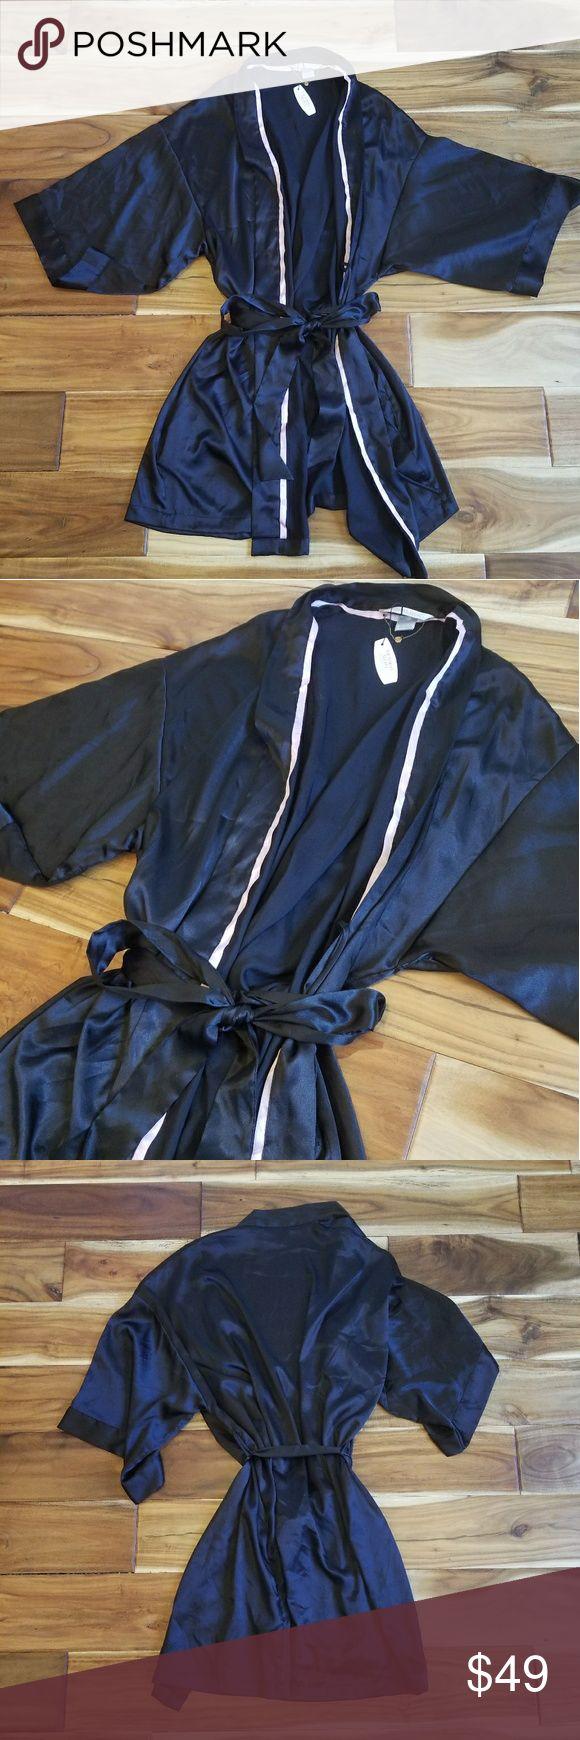 NWT Victoria's Secret Satin Kimono Robe NWT Victoria's Secret Satin Kimono Robe. New, never worn! Size small/medium. Beautiful black satin robe trimmed with pink. No trades, offers welcome.  Enjoy! Victoria's Secret Intimates & Sleepwear Robes